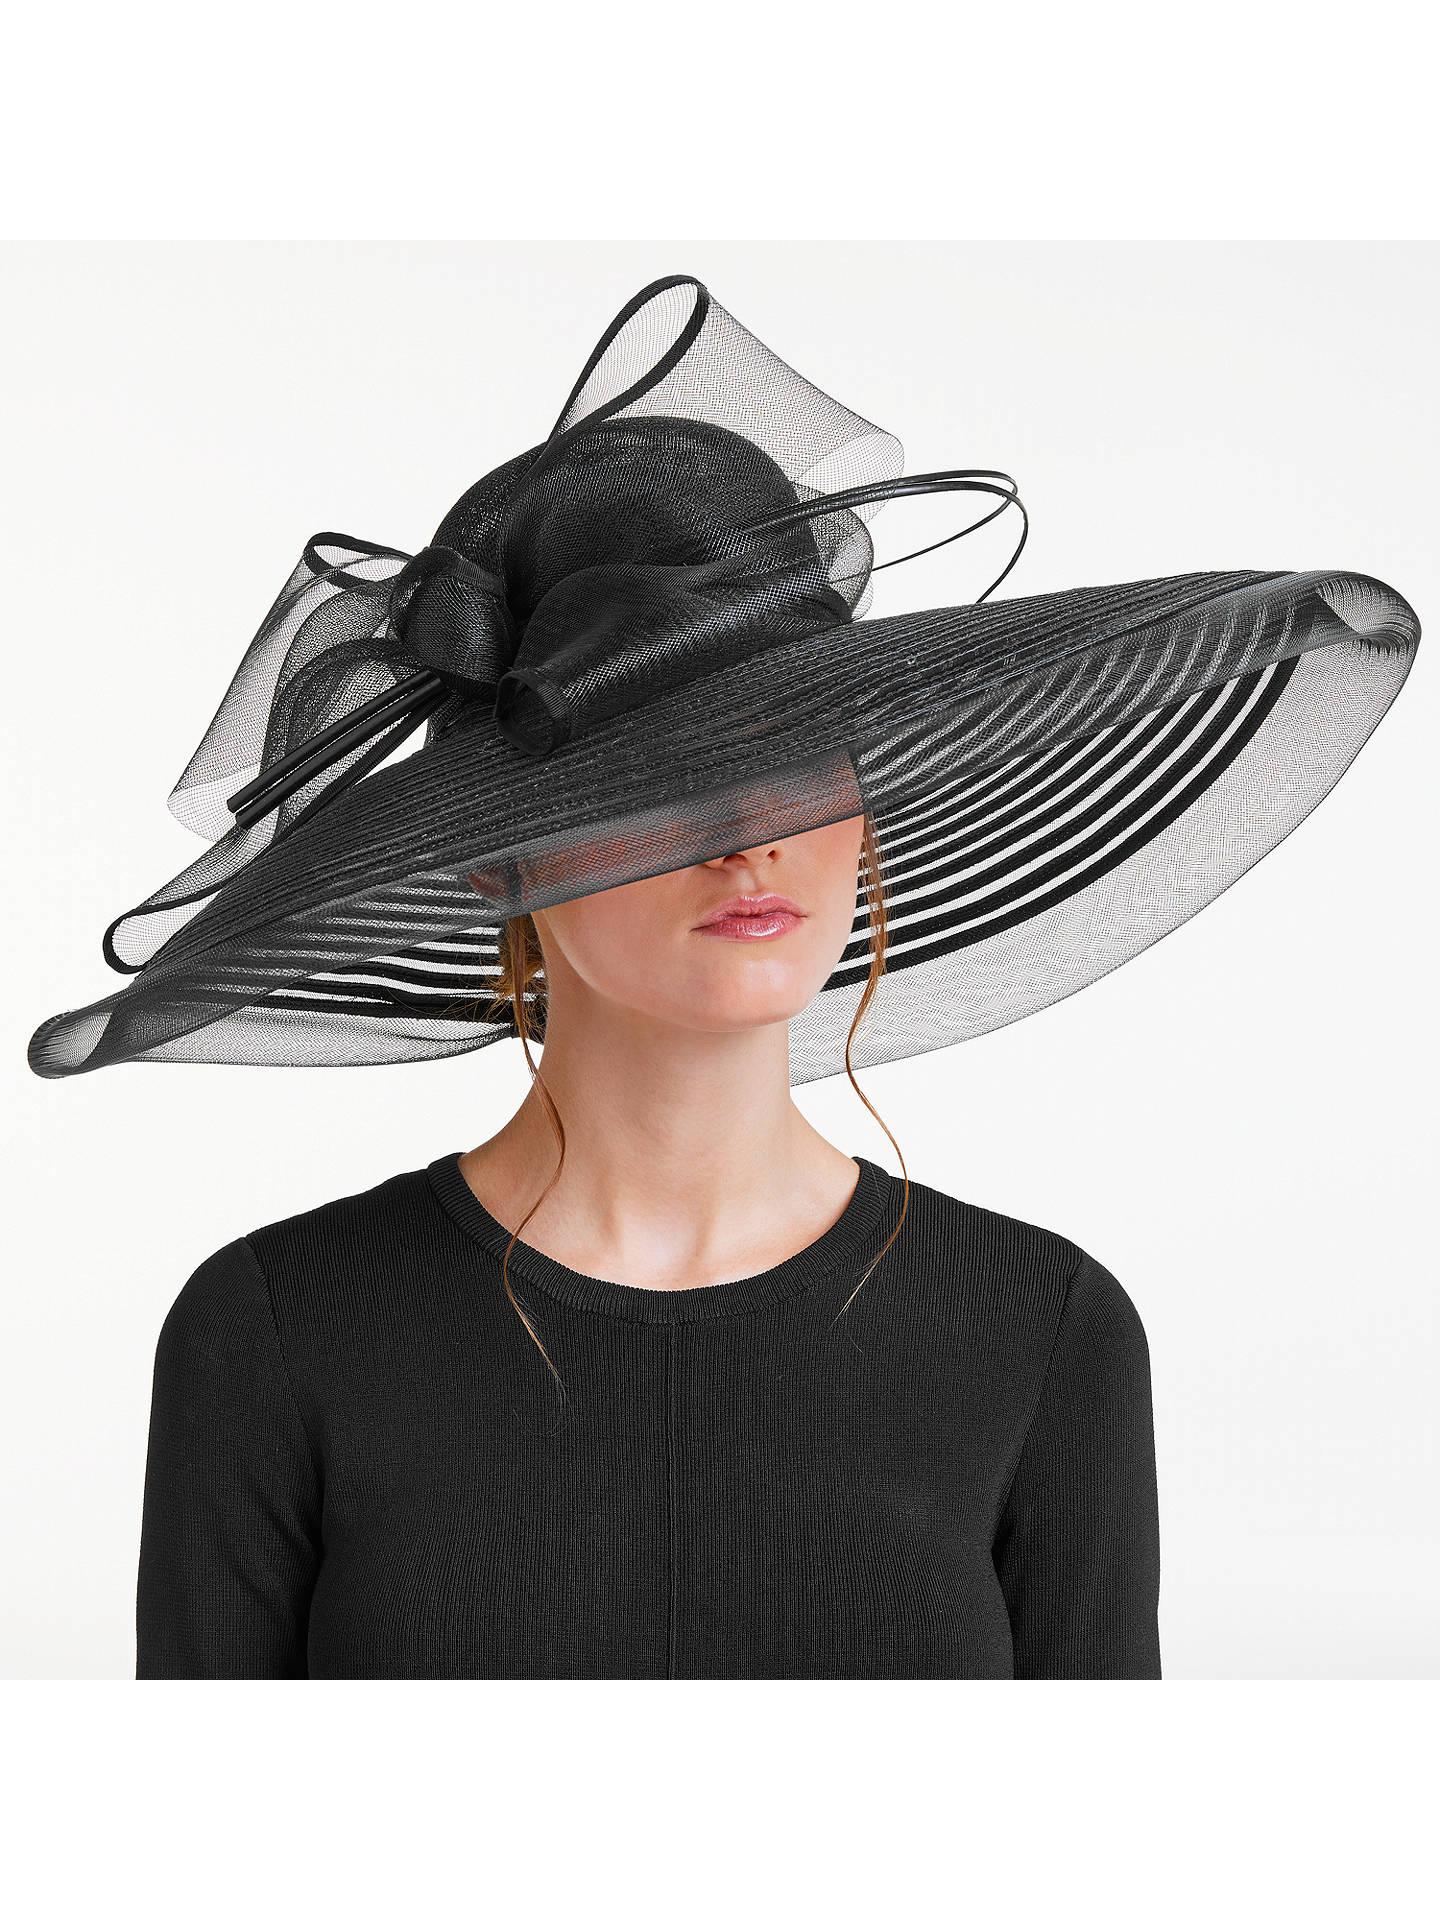 Ladies Black Flower Feather Fascinator Aliceband Hat Hair band Formal Race Royal